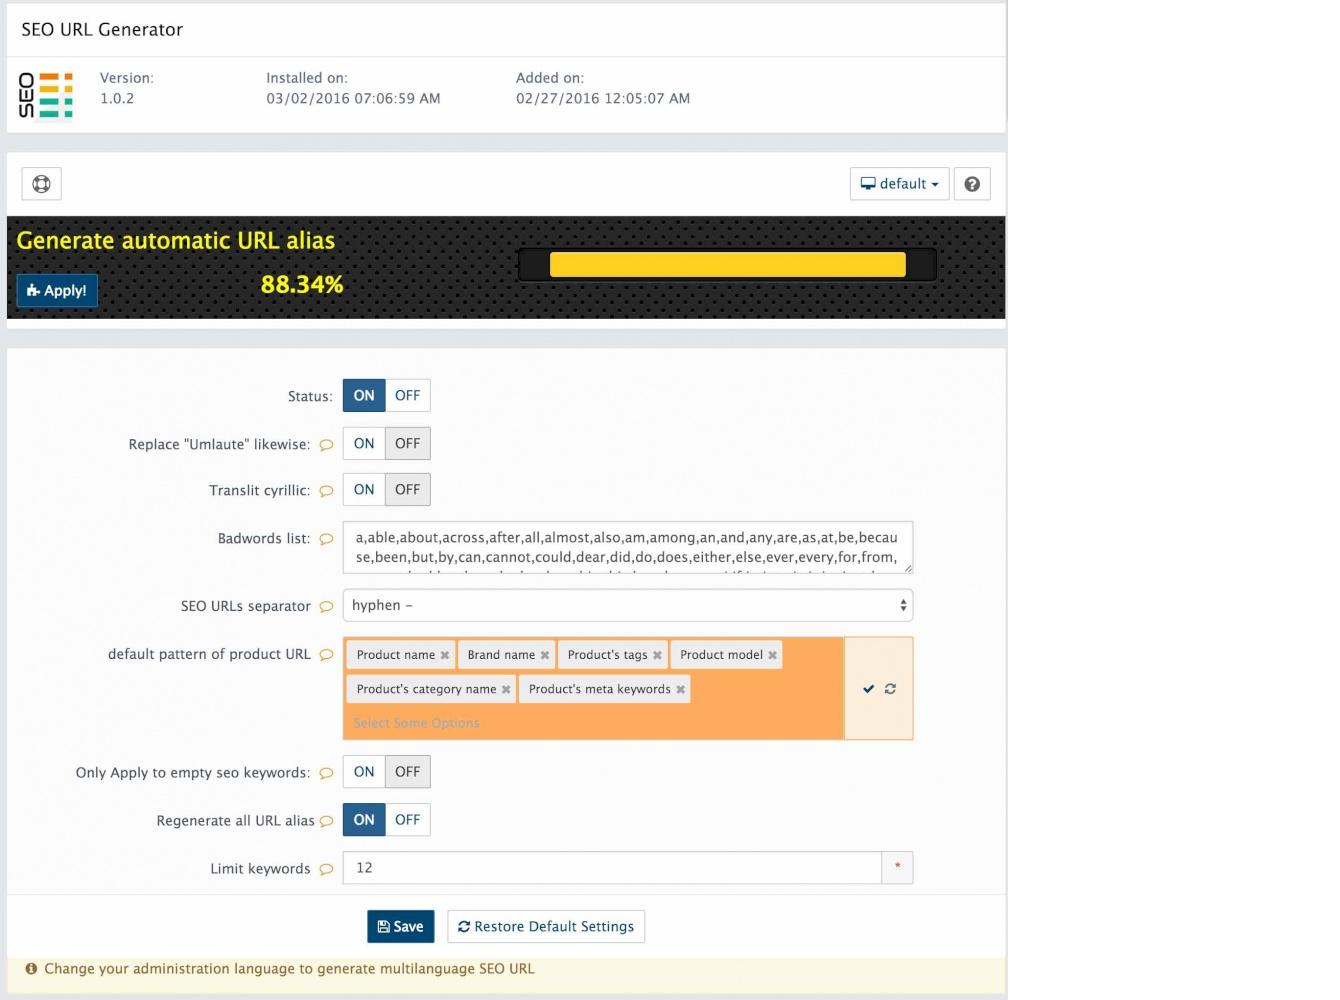 One click SEO URL Generator